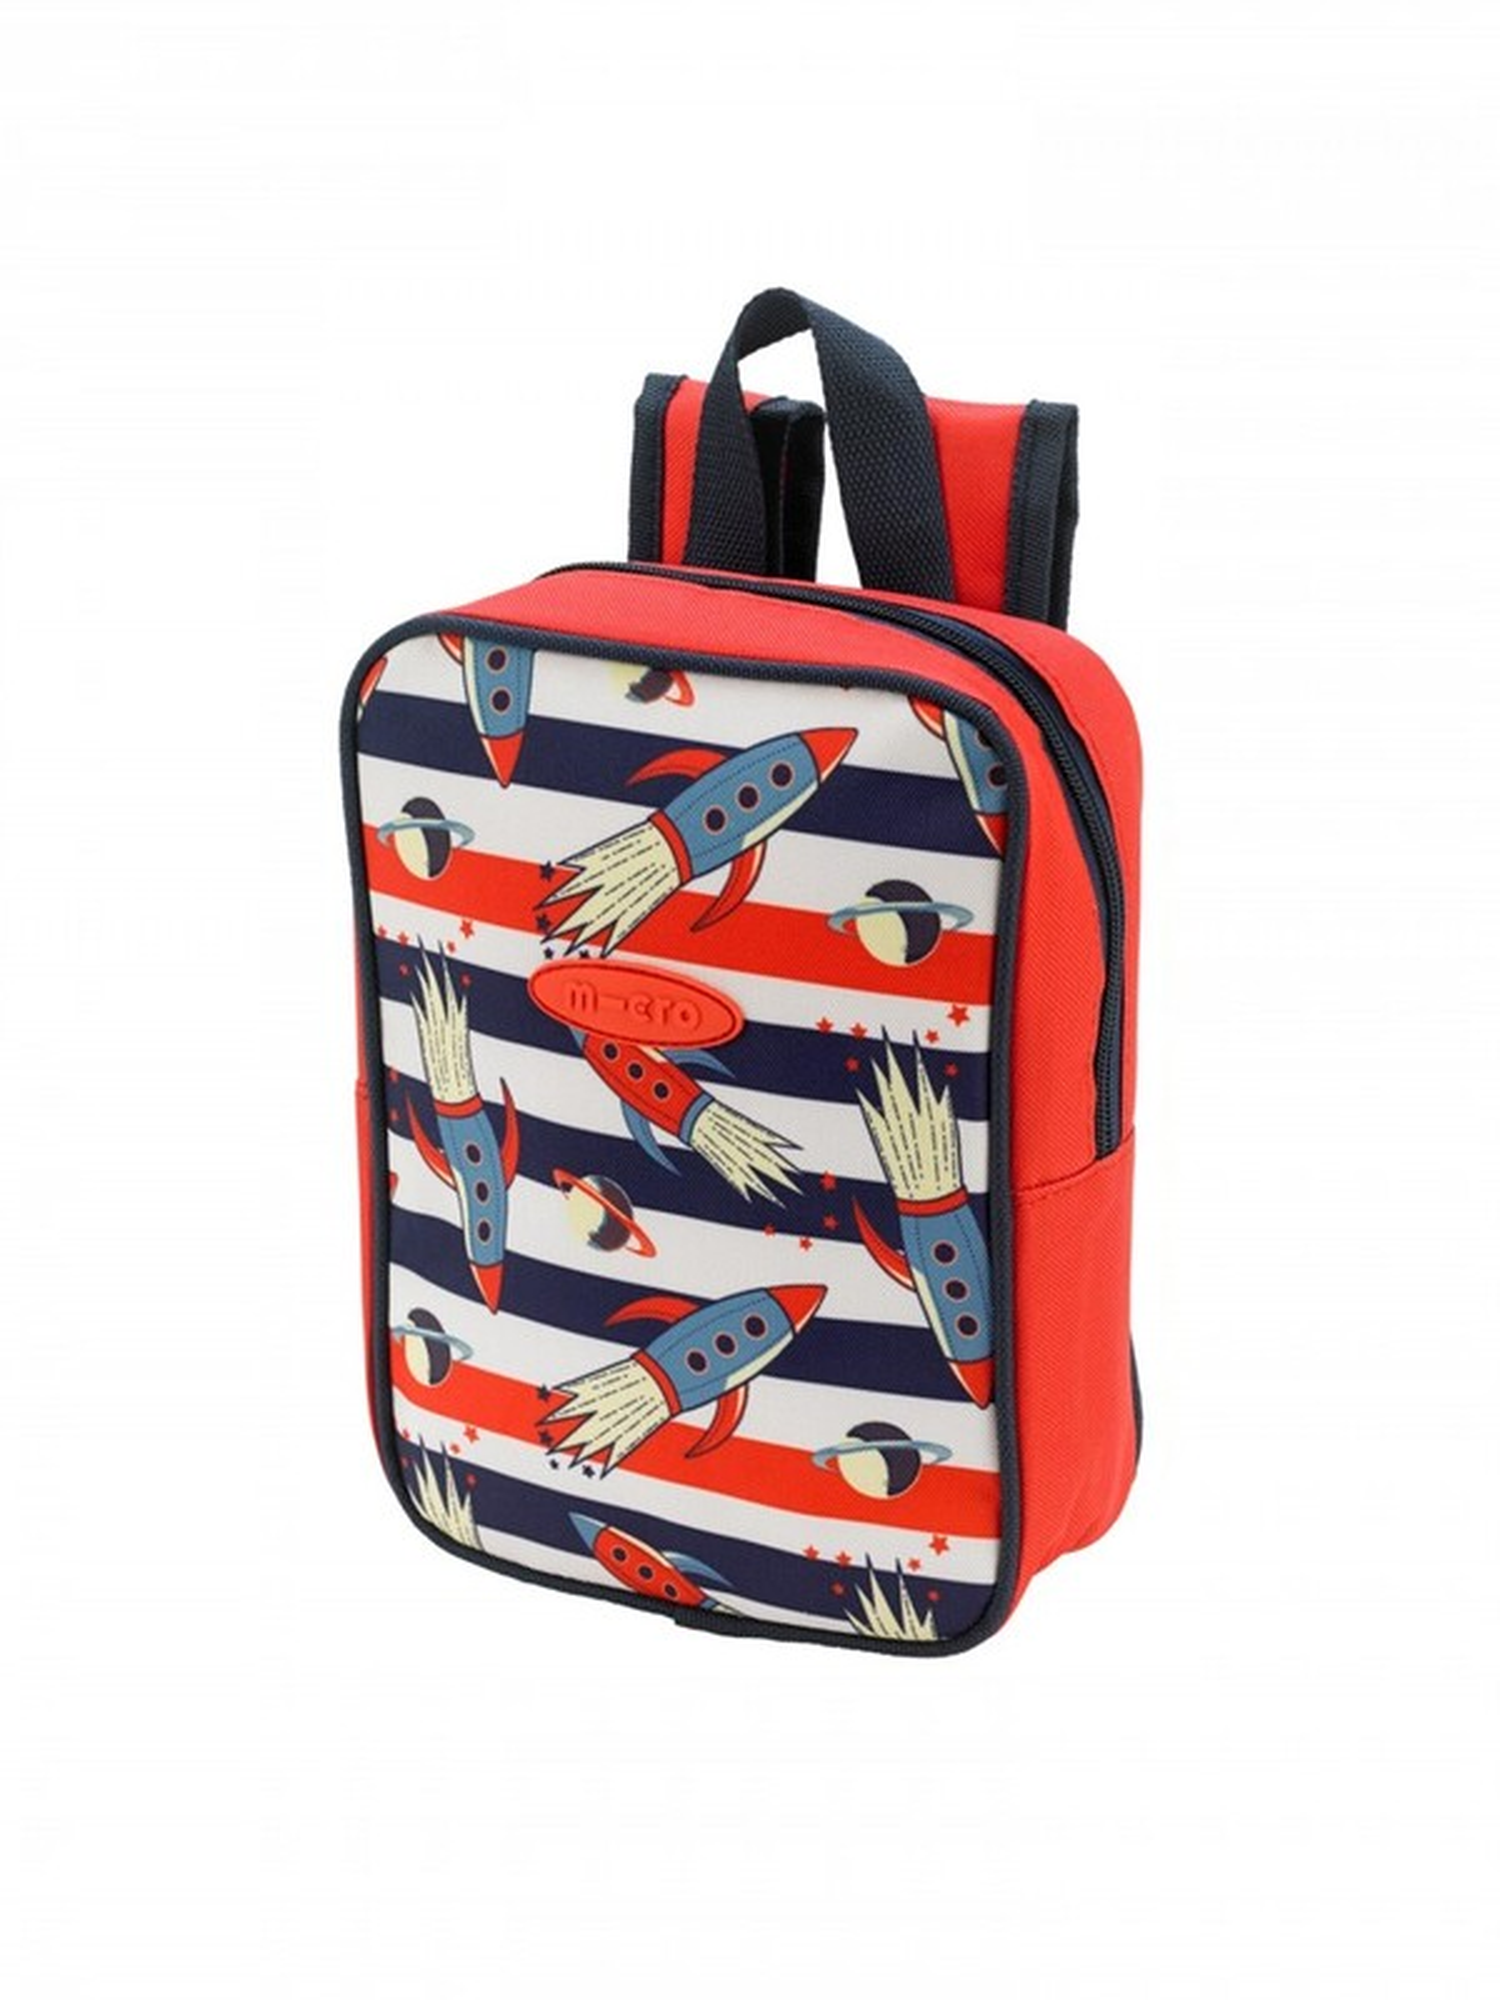 Micro - Lunch Bag Rocket